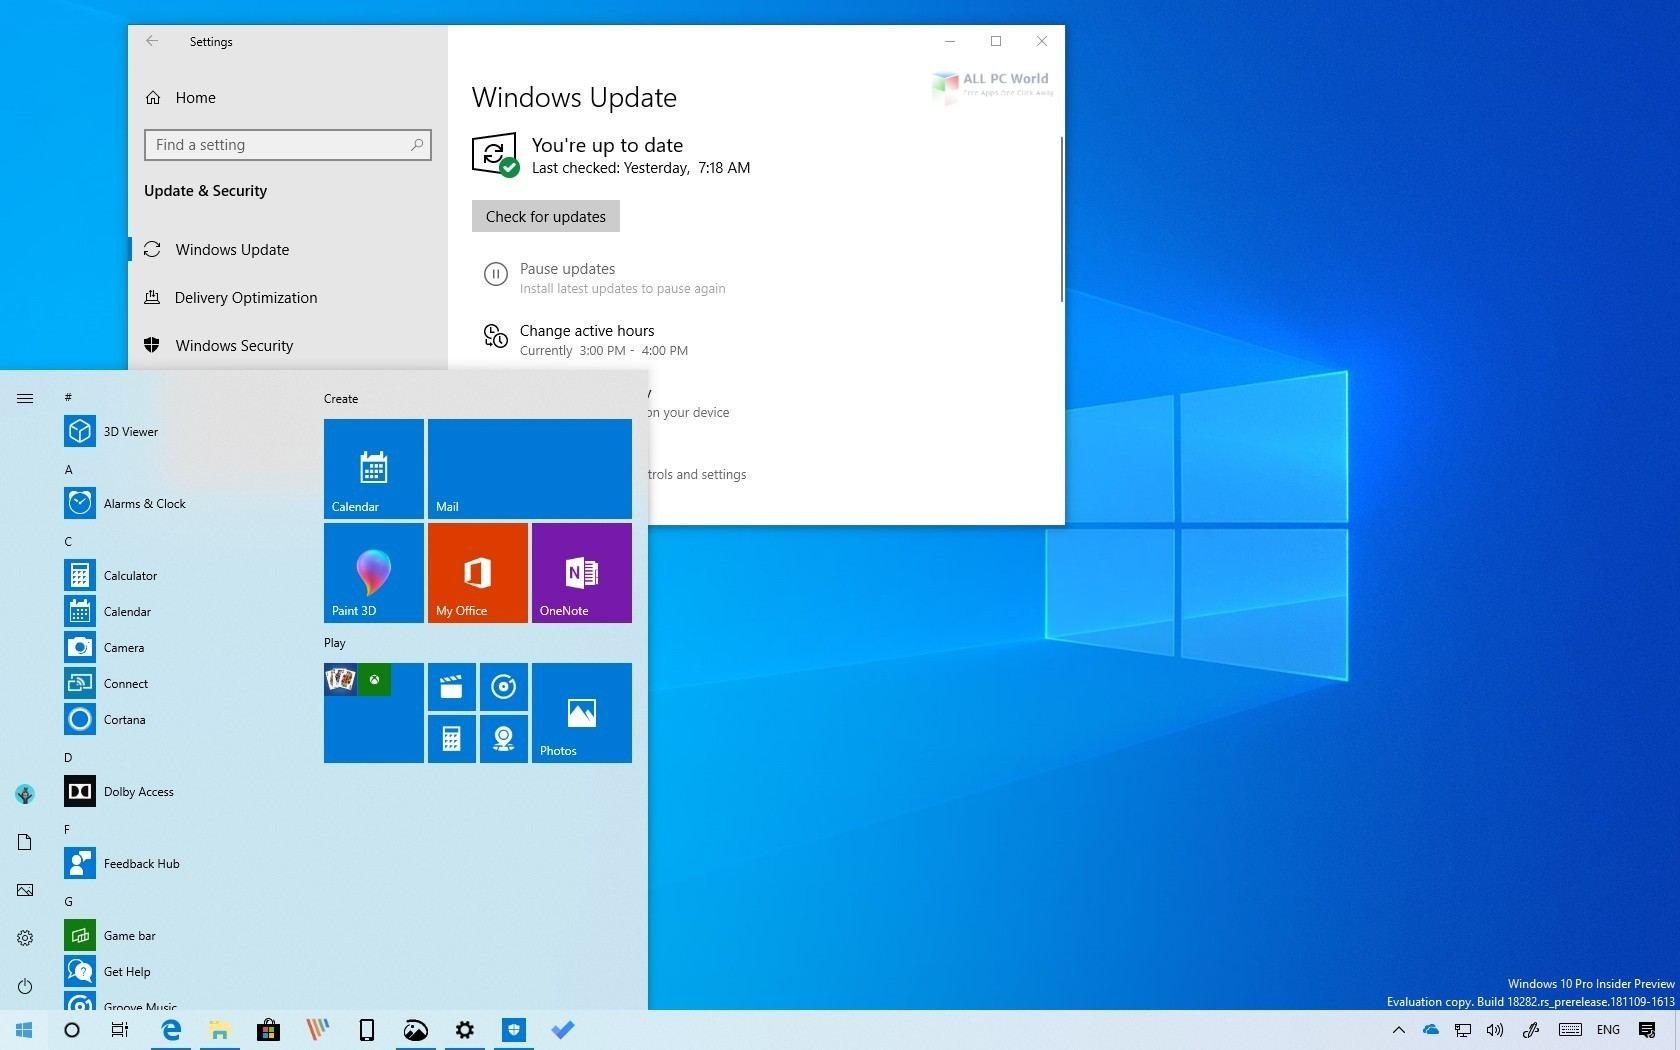 Windows 10 19H1 Lite Edition v9 2019 Free Download